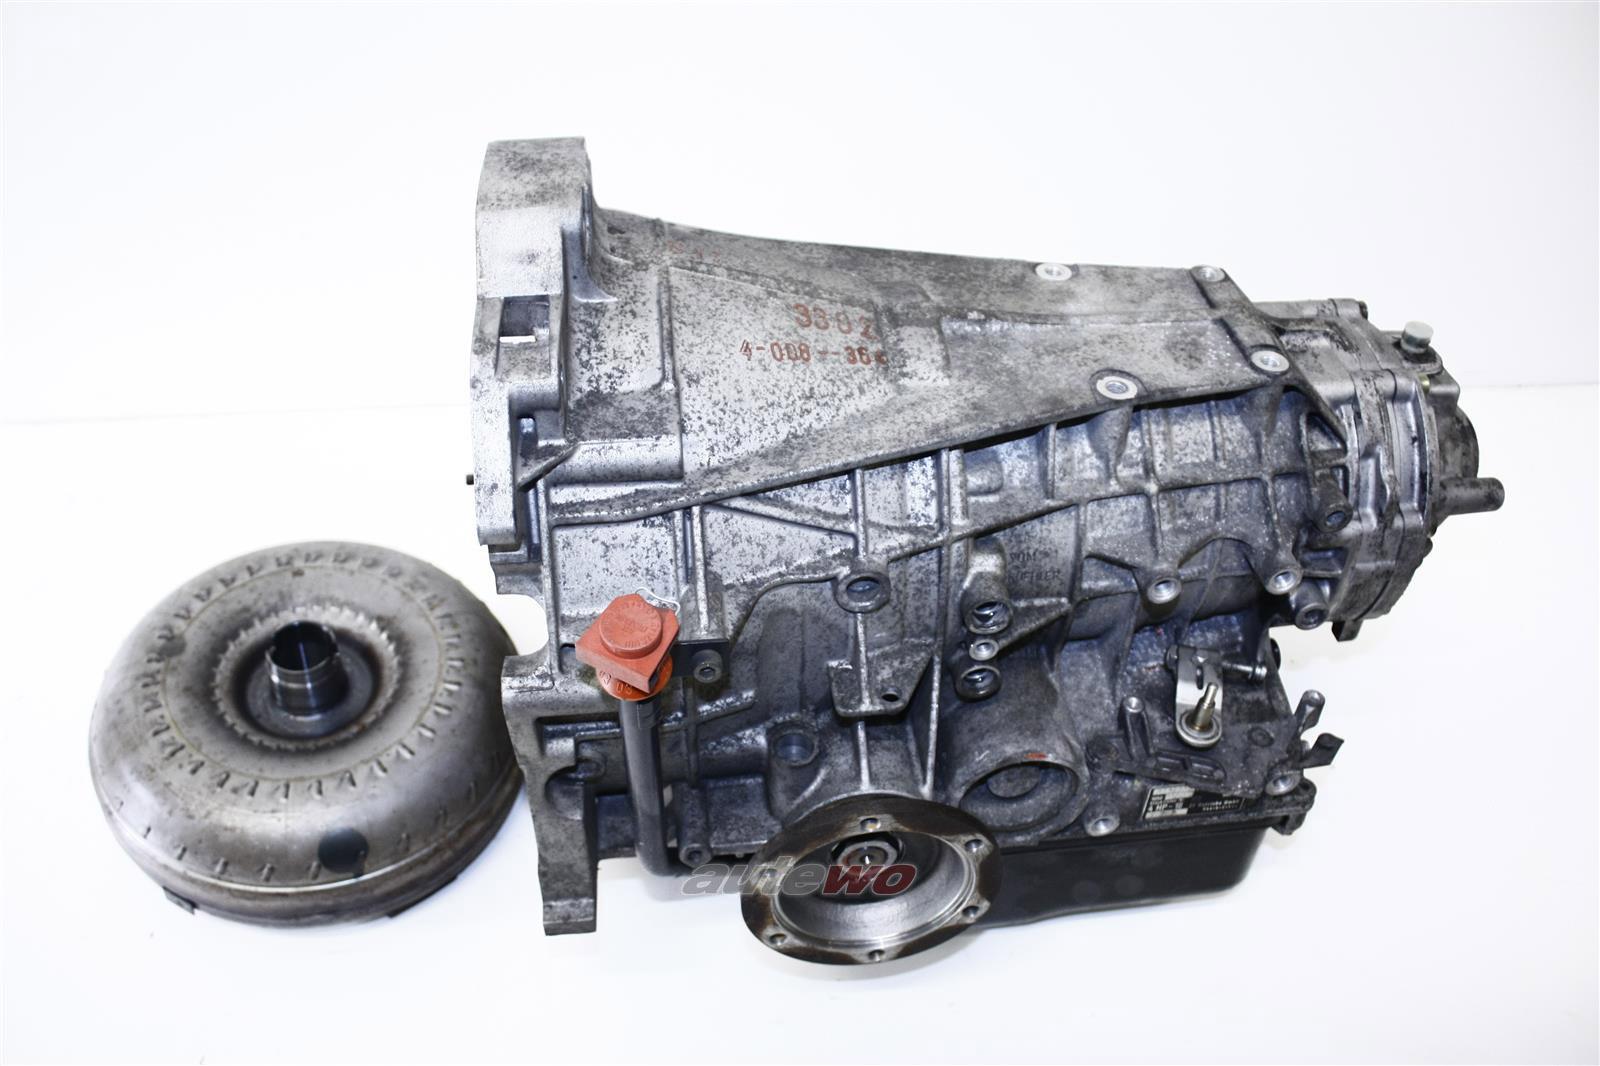 Audi 100 C4 2.5l TDI Automatikgetriebe CDS 0032008 01K300041DX 143000km